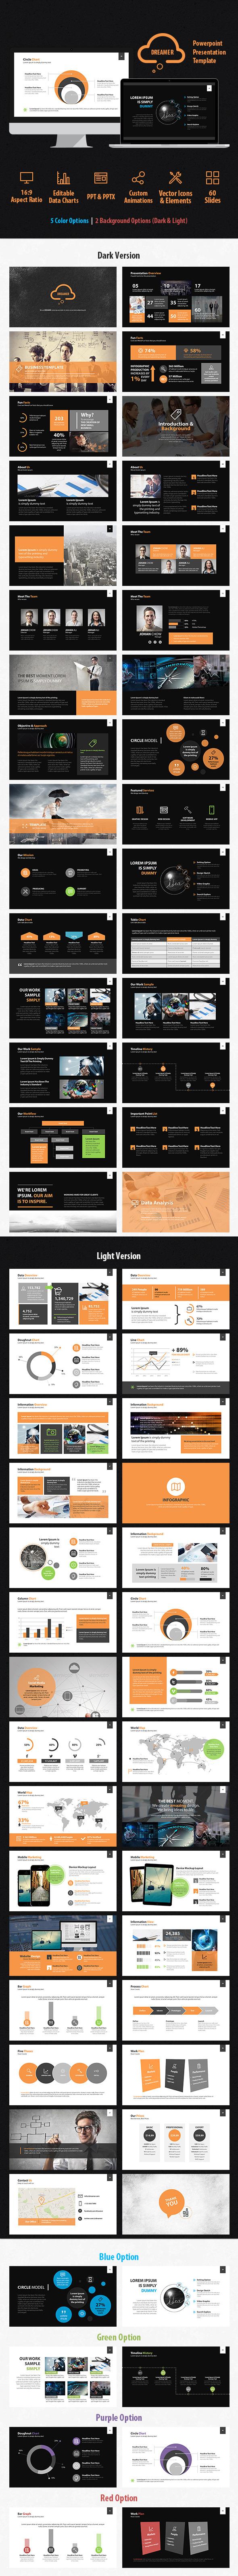 Dreamer Powerpoint Presentation Template - Business PowerPoint Templates